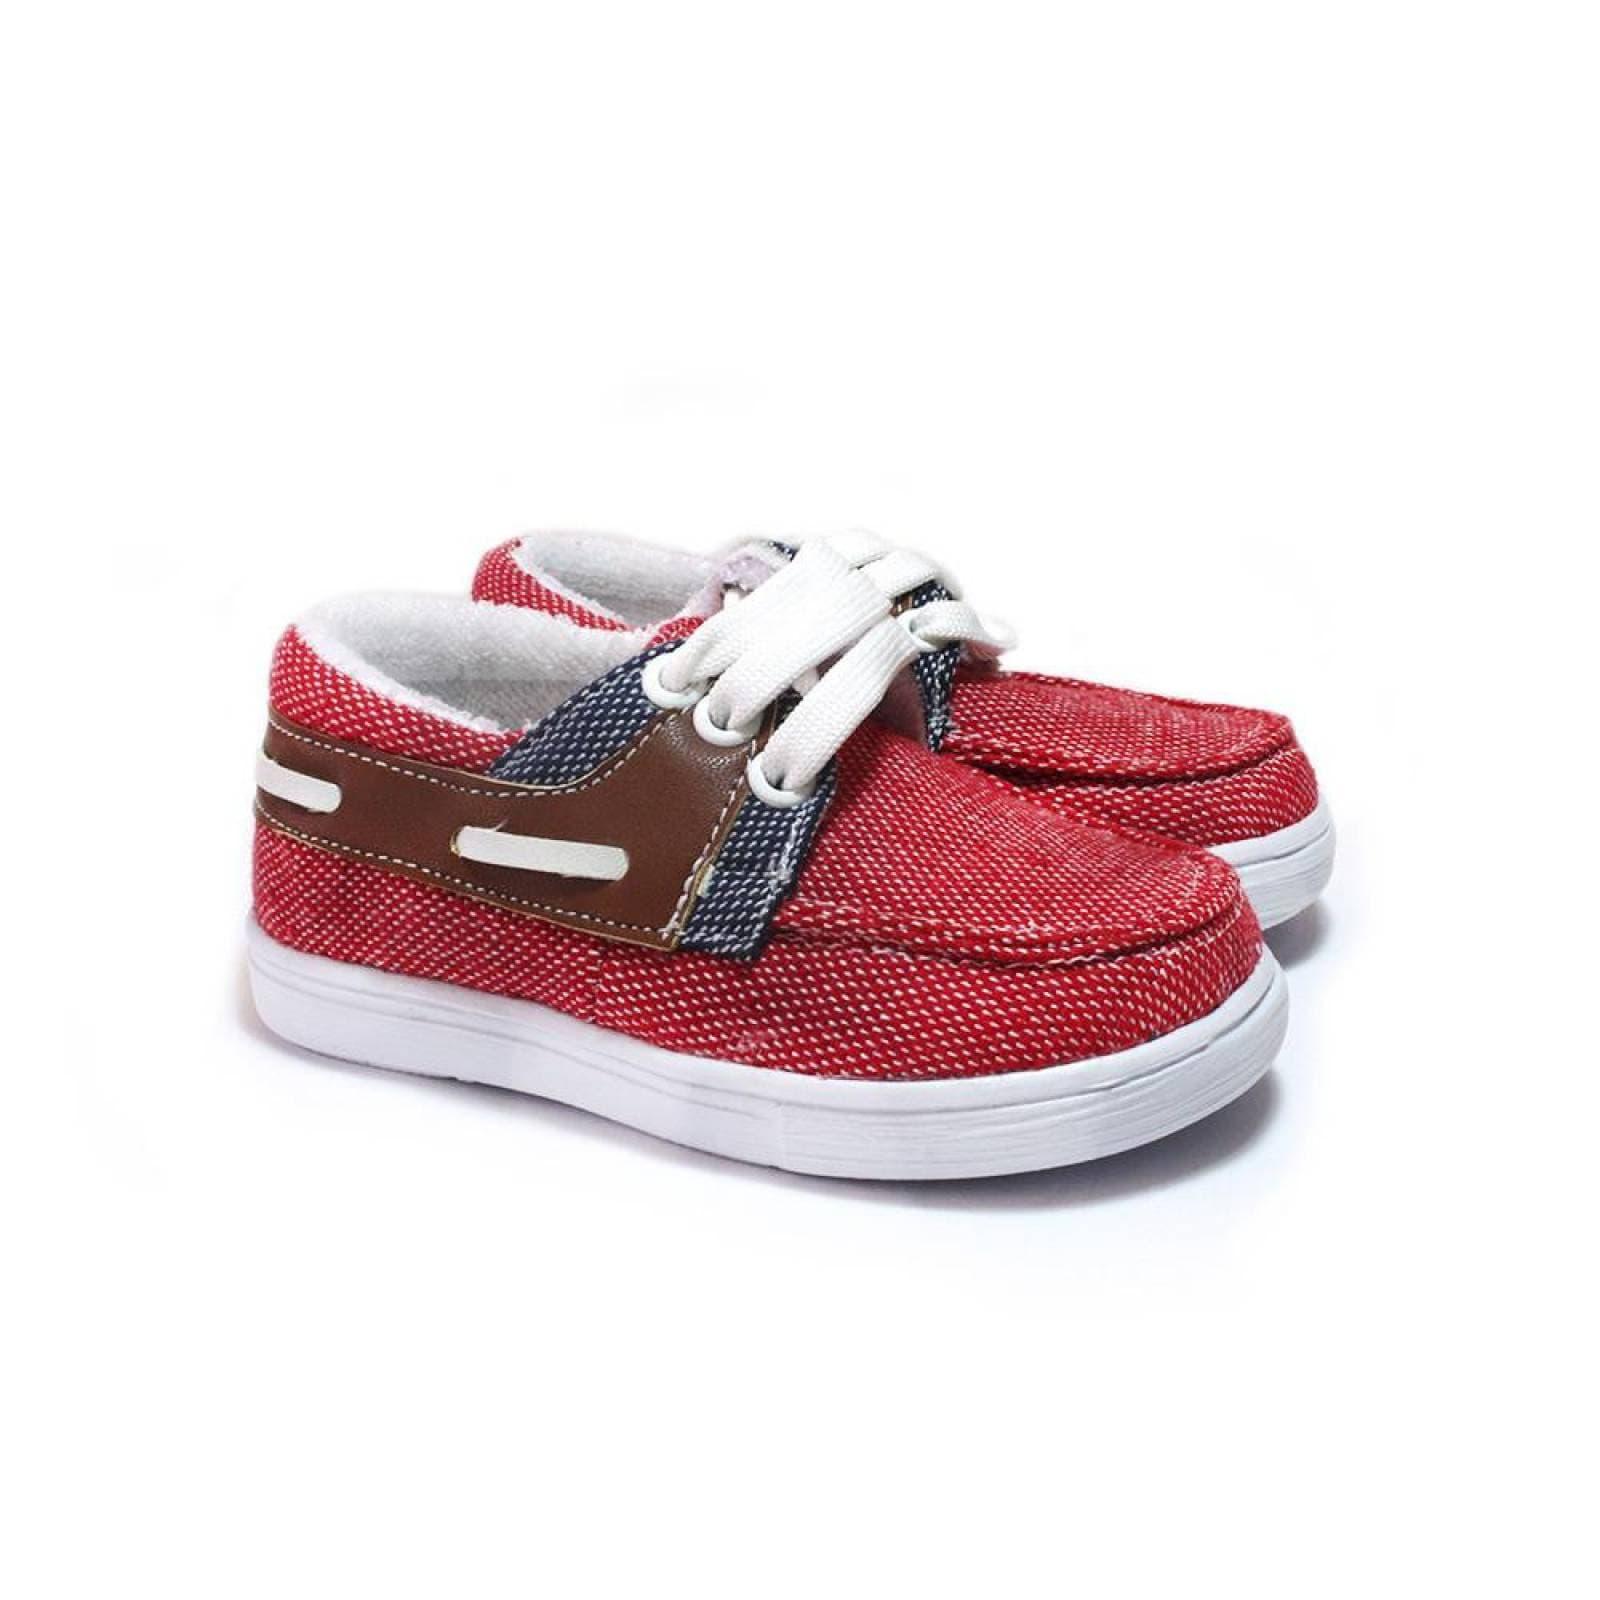 Tenis Zapato Casual Mini Fausto Artesanal Infantil Rojo Komoni Talla: 21